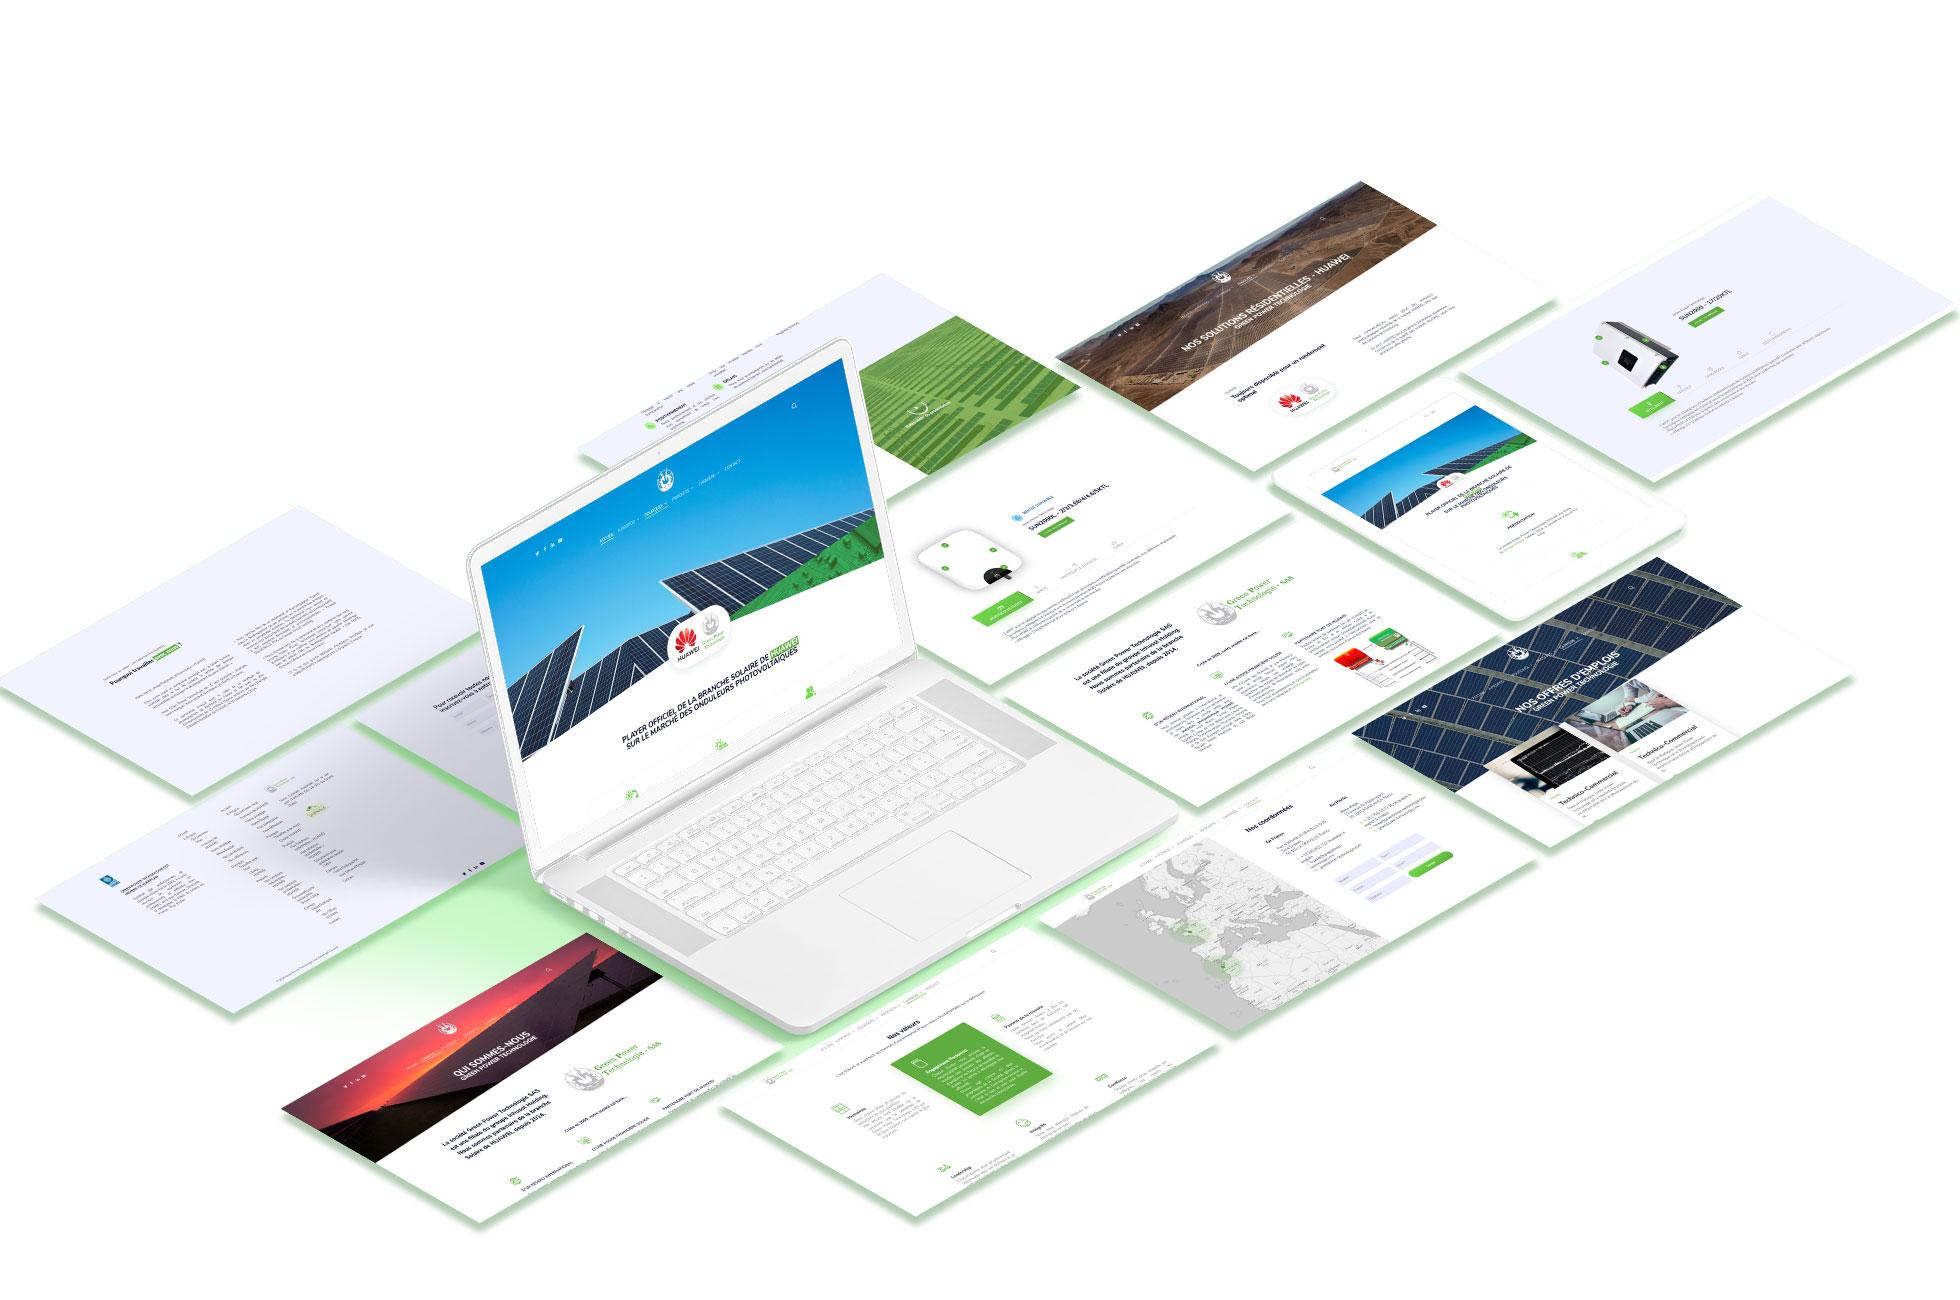 interface green power wordpress agence web design lyon arkanite graphisme developpement logo illustrations ecommerce application mobile